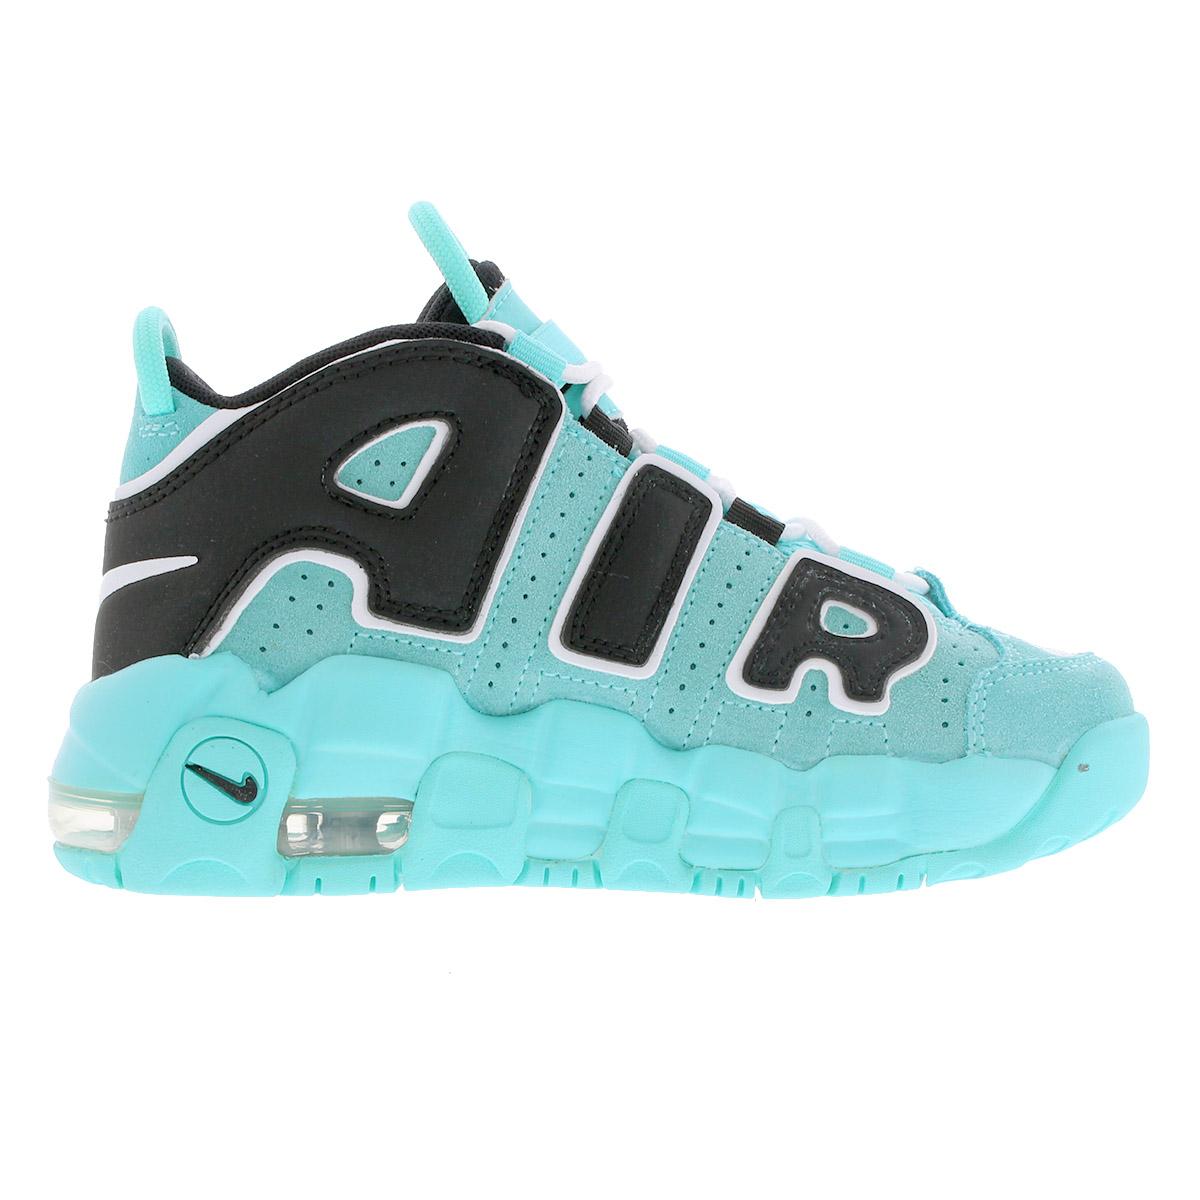 NIKE AIR MORE UPTEMPO PS Nike more up tempo PS LIGHT AQUABLACKWHITE aa1554 403